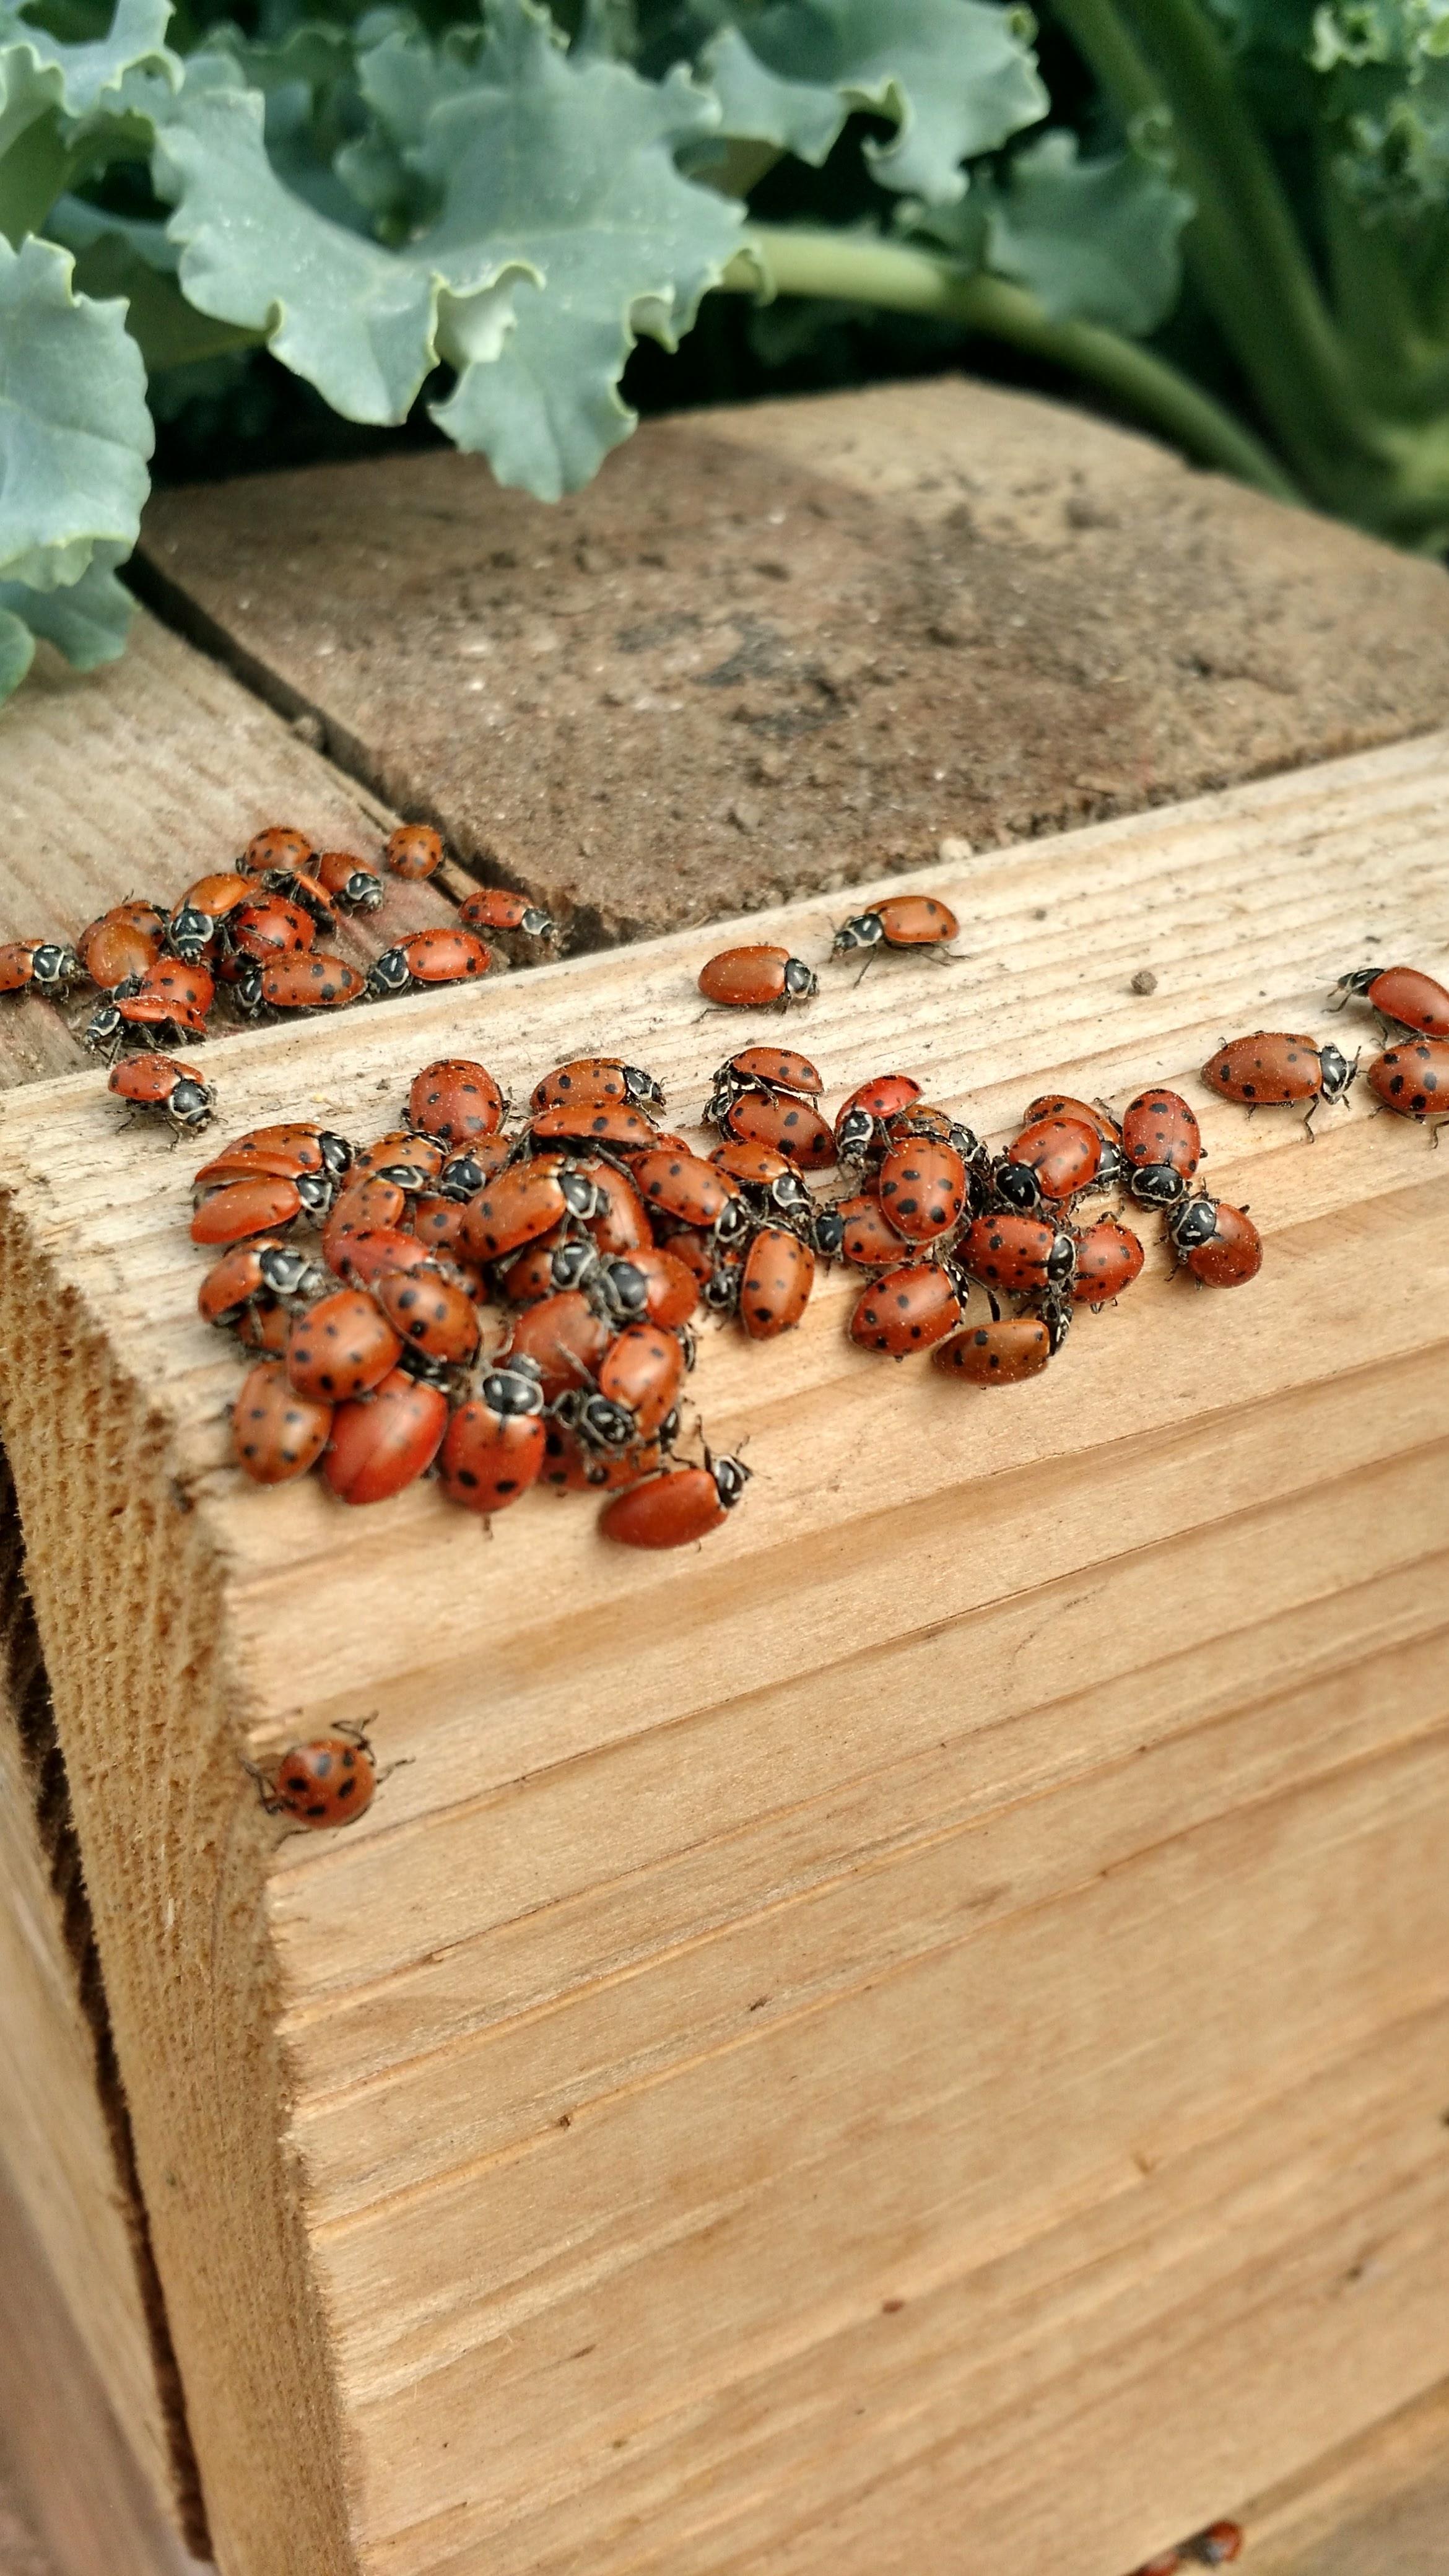 Desiderata Ranch Ladybugs